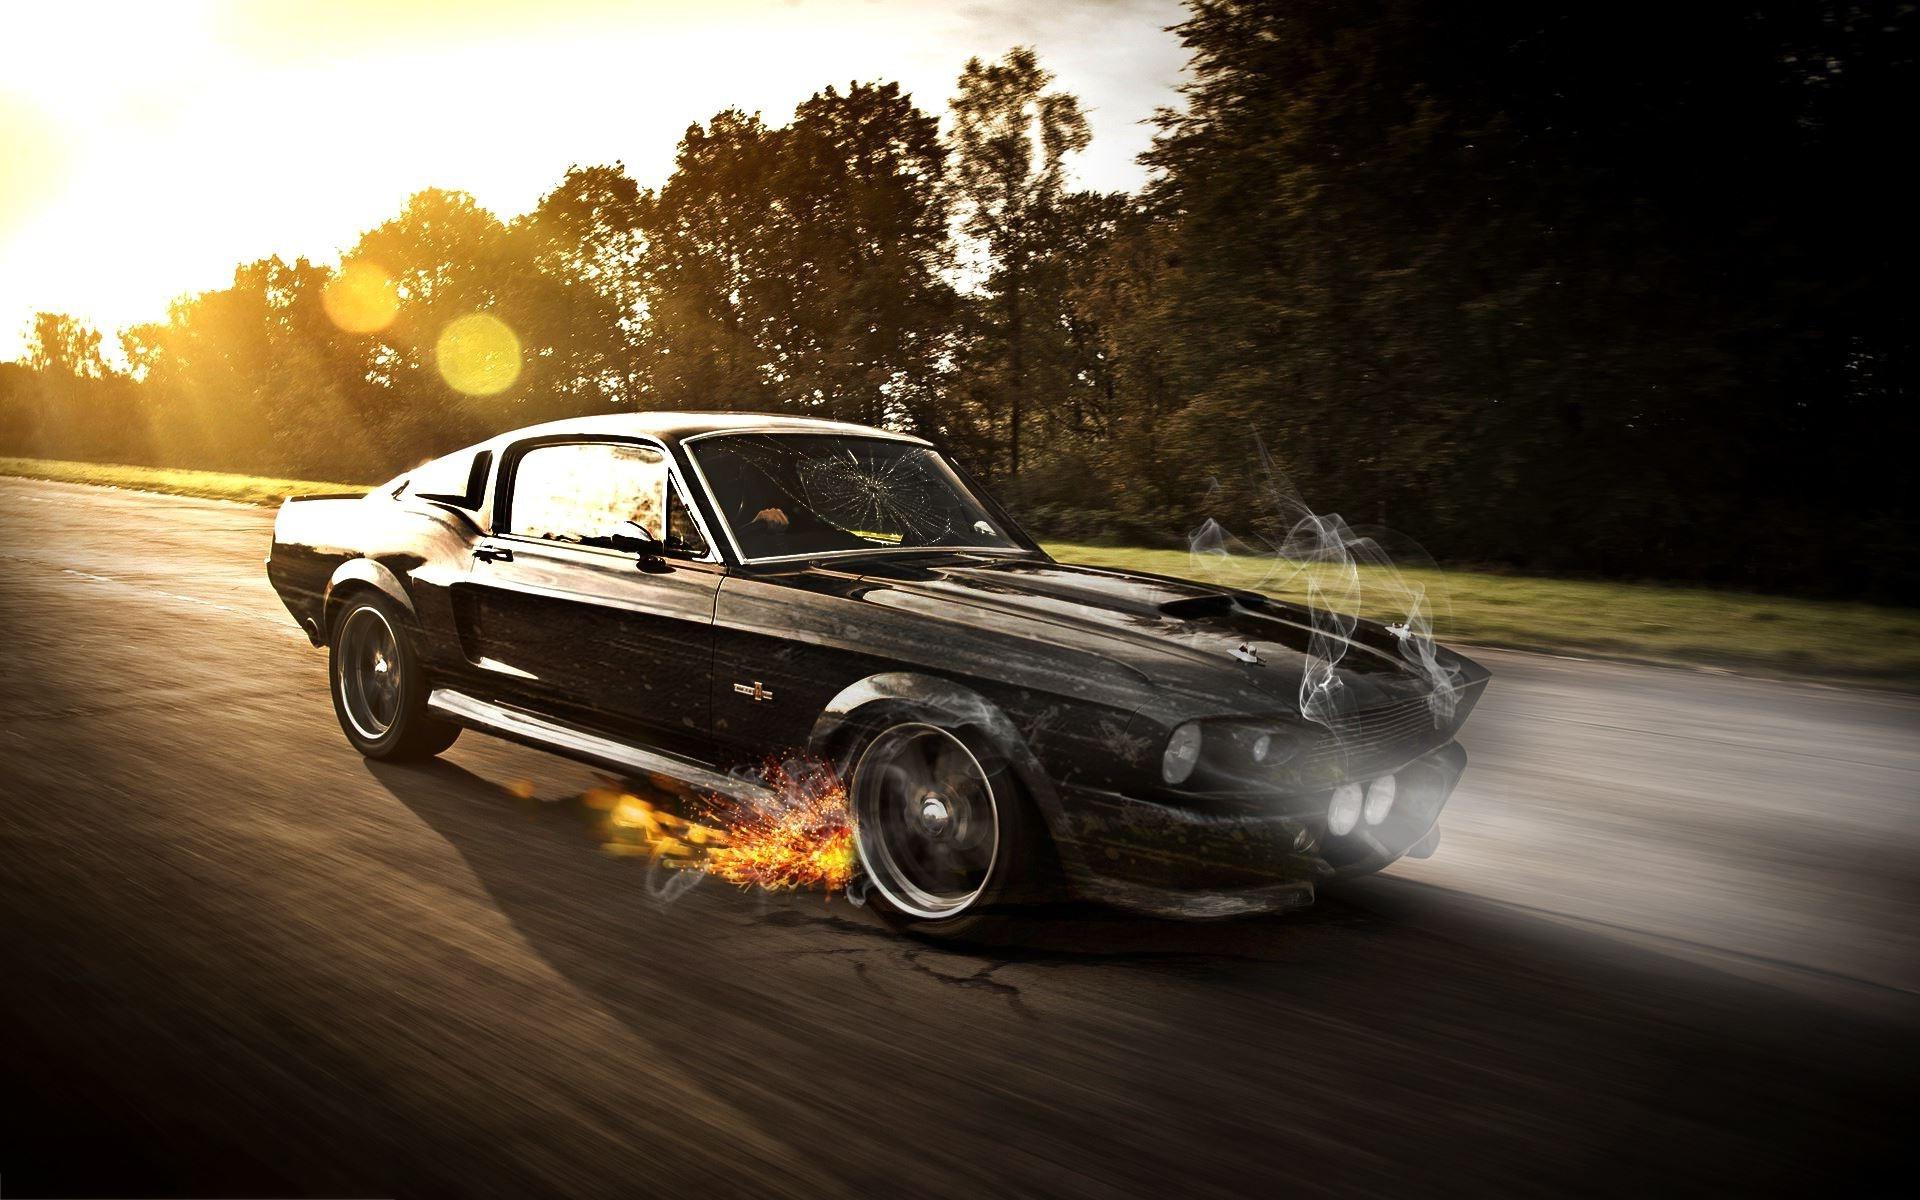 American Muscle Car Desktop Wallpapers Mustang Shelby Wallpaper Photoshop 1253 Wallpaper